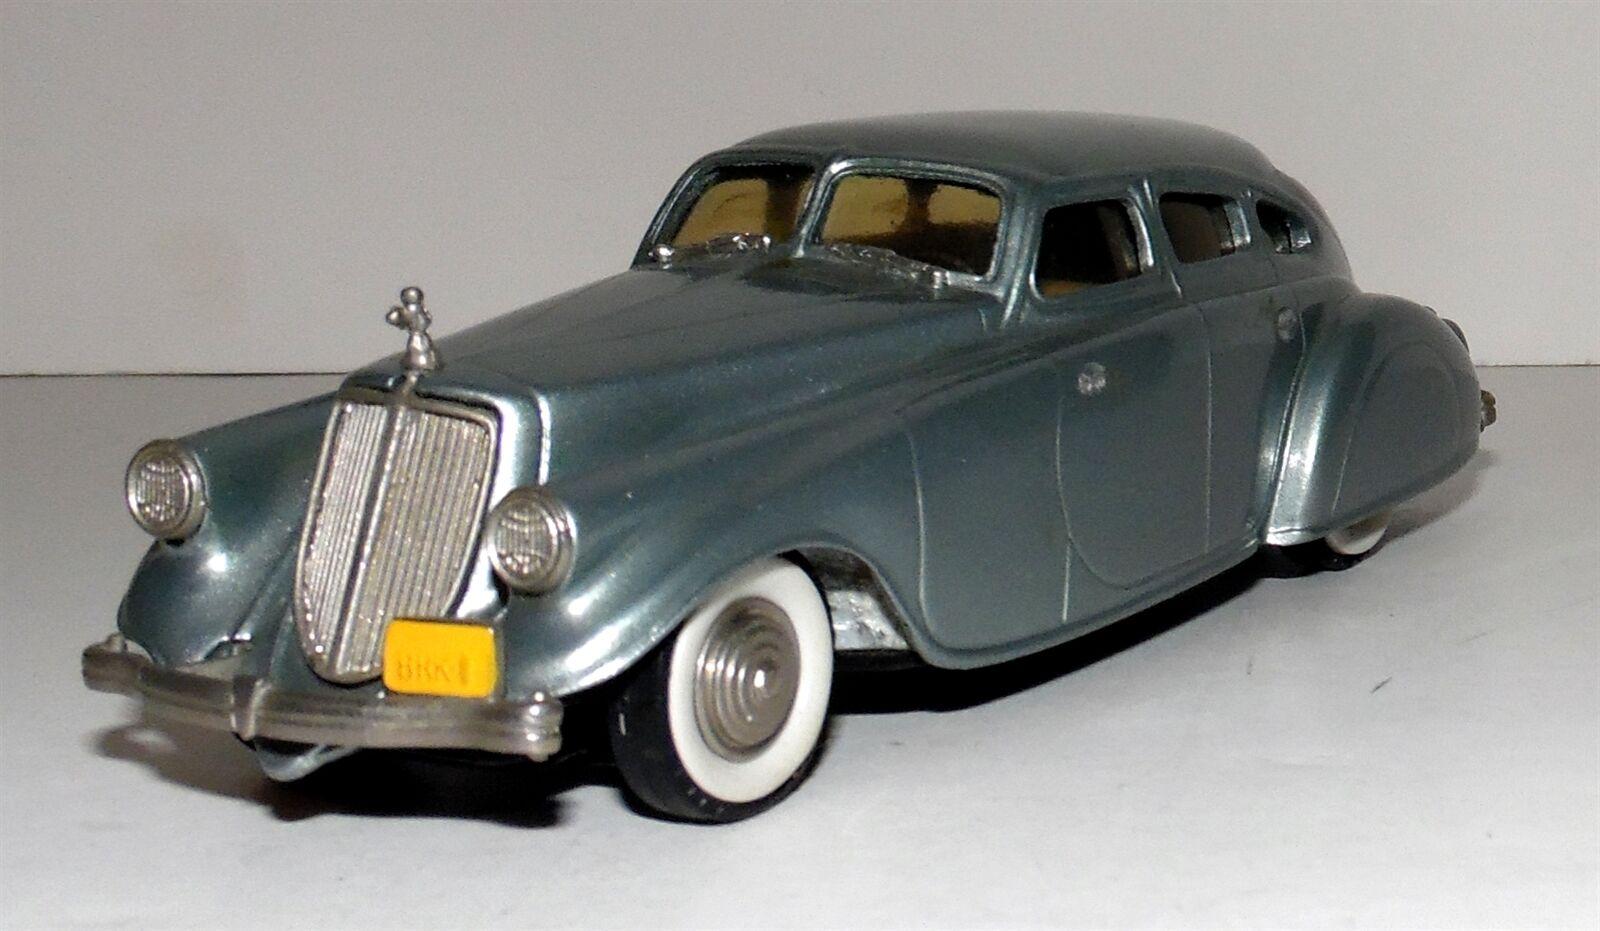 1933 Pierce Arrow  Sedan Brooklin 1 43 Scale W  Box. Both in Very Nice Condition